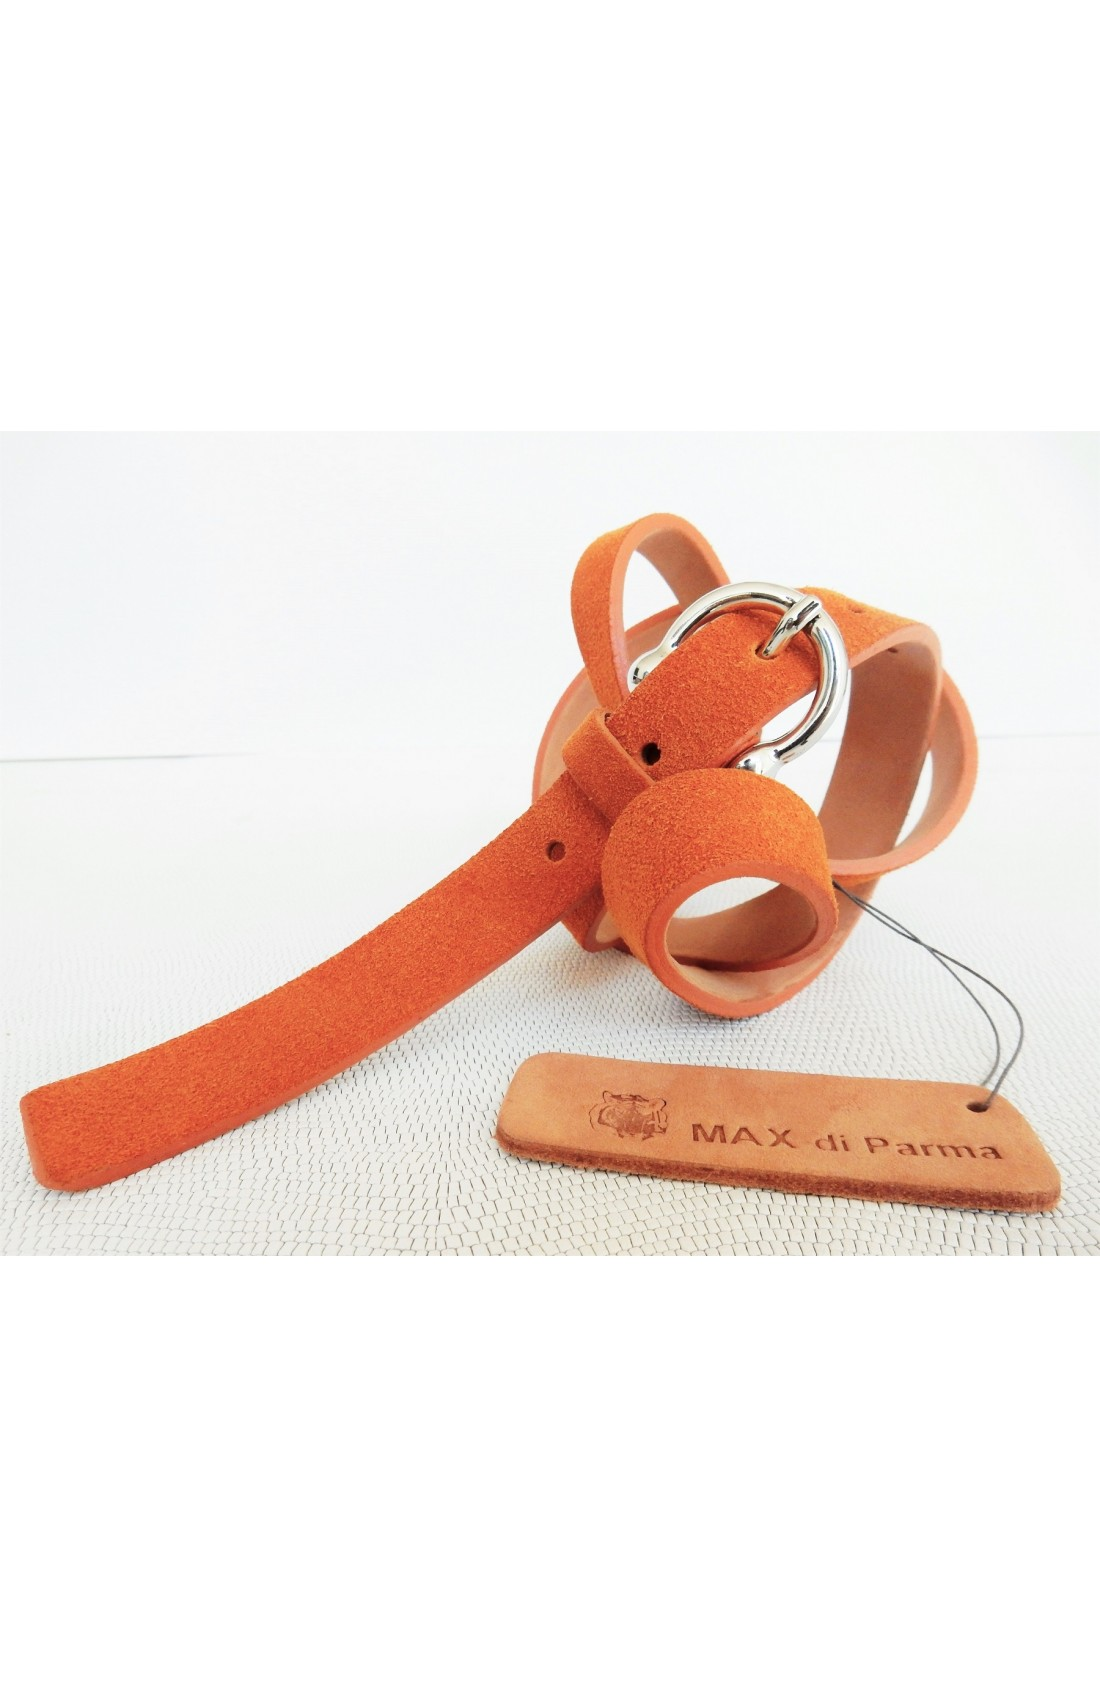 art. 601 SCAMOSCIATO mm.20 var.81 arancio mattone fibbia L 70 mm.20 nikel free (1)